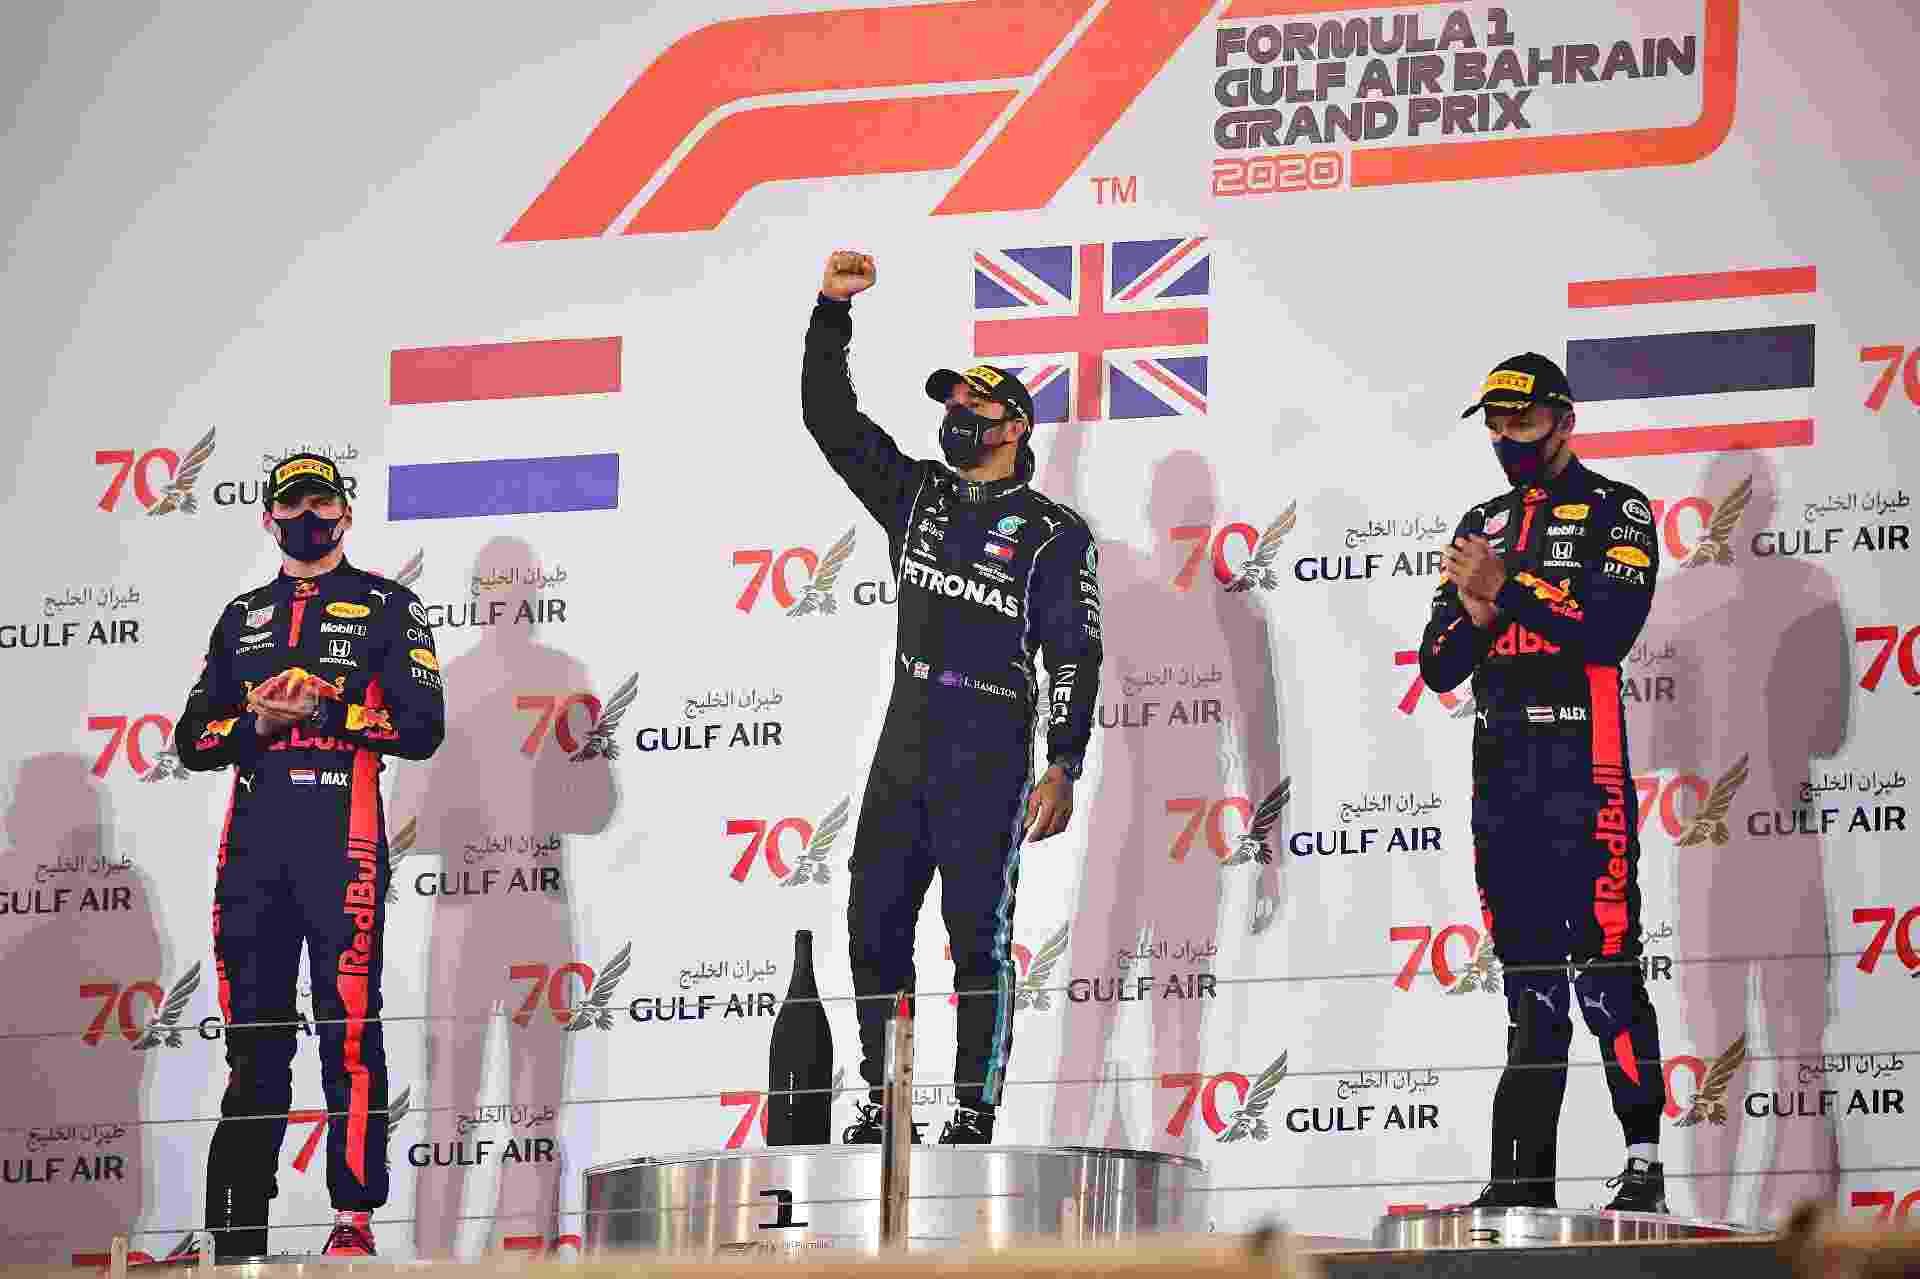 Lewis Hamilton ao centro, entre Alexander Albon (3º) e Max Verstappen (2º) no GP do Bahrein - Giuseppe Cacace/Pool/Getty Images